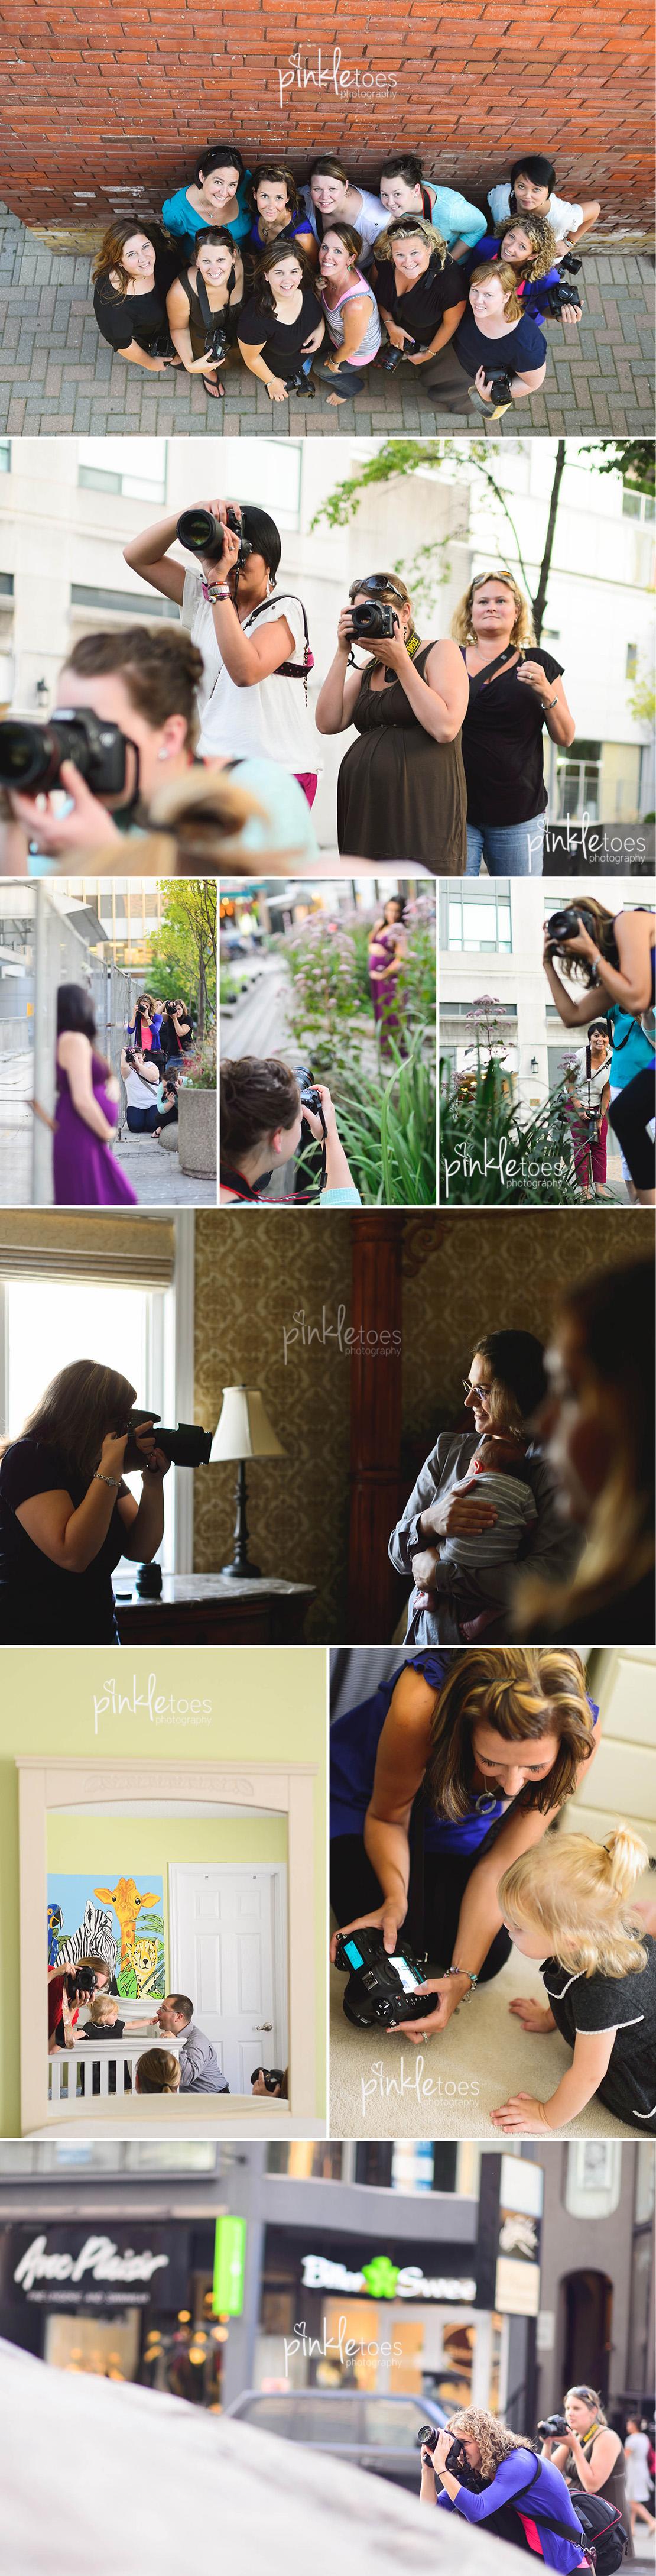 ta-pinkle-toes-austin-toronto-lifestyle-photography-workshop-california-seattle-sandiego-santarosa-sydney-perth-australia